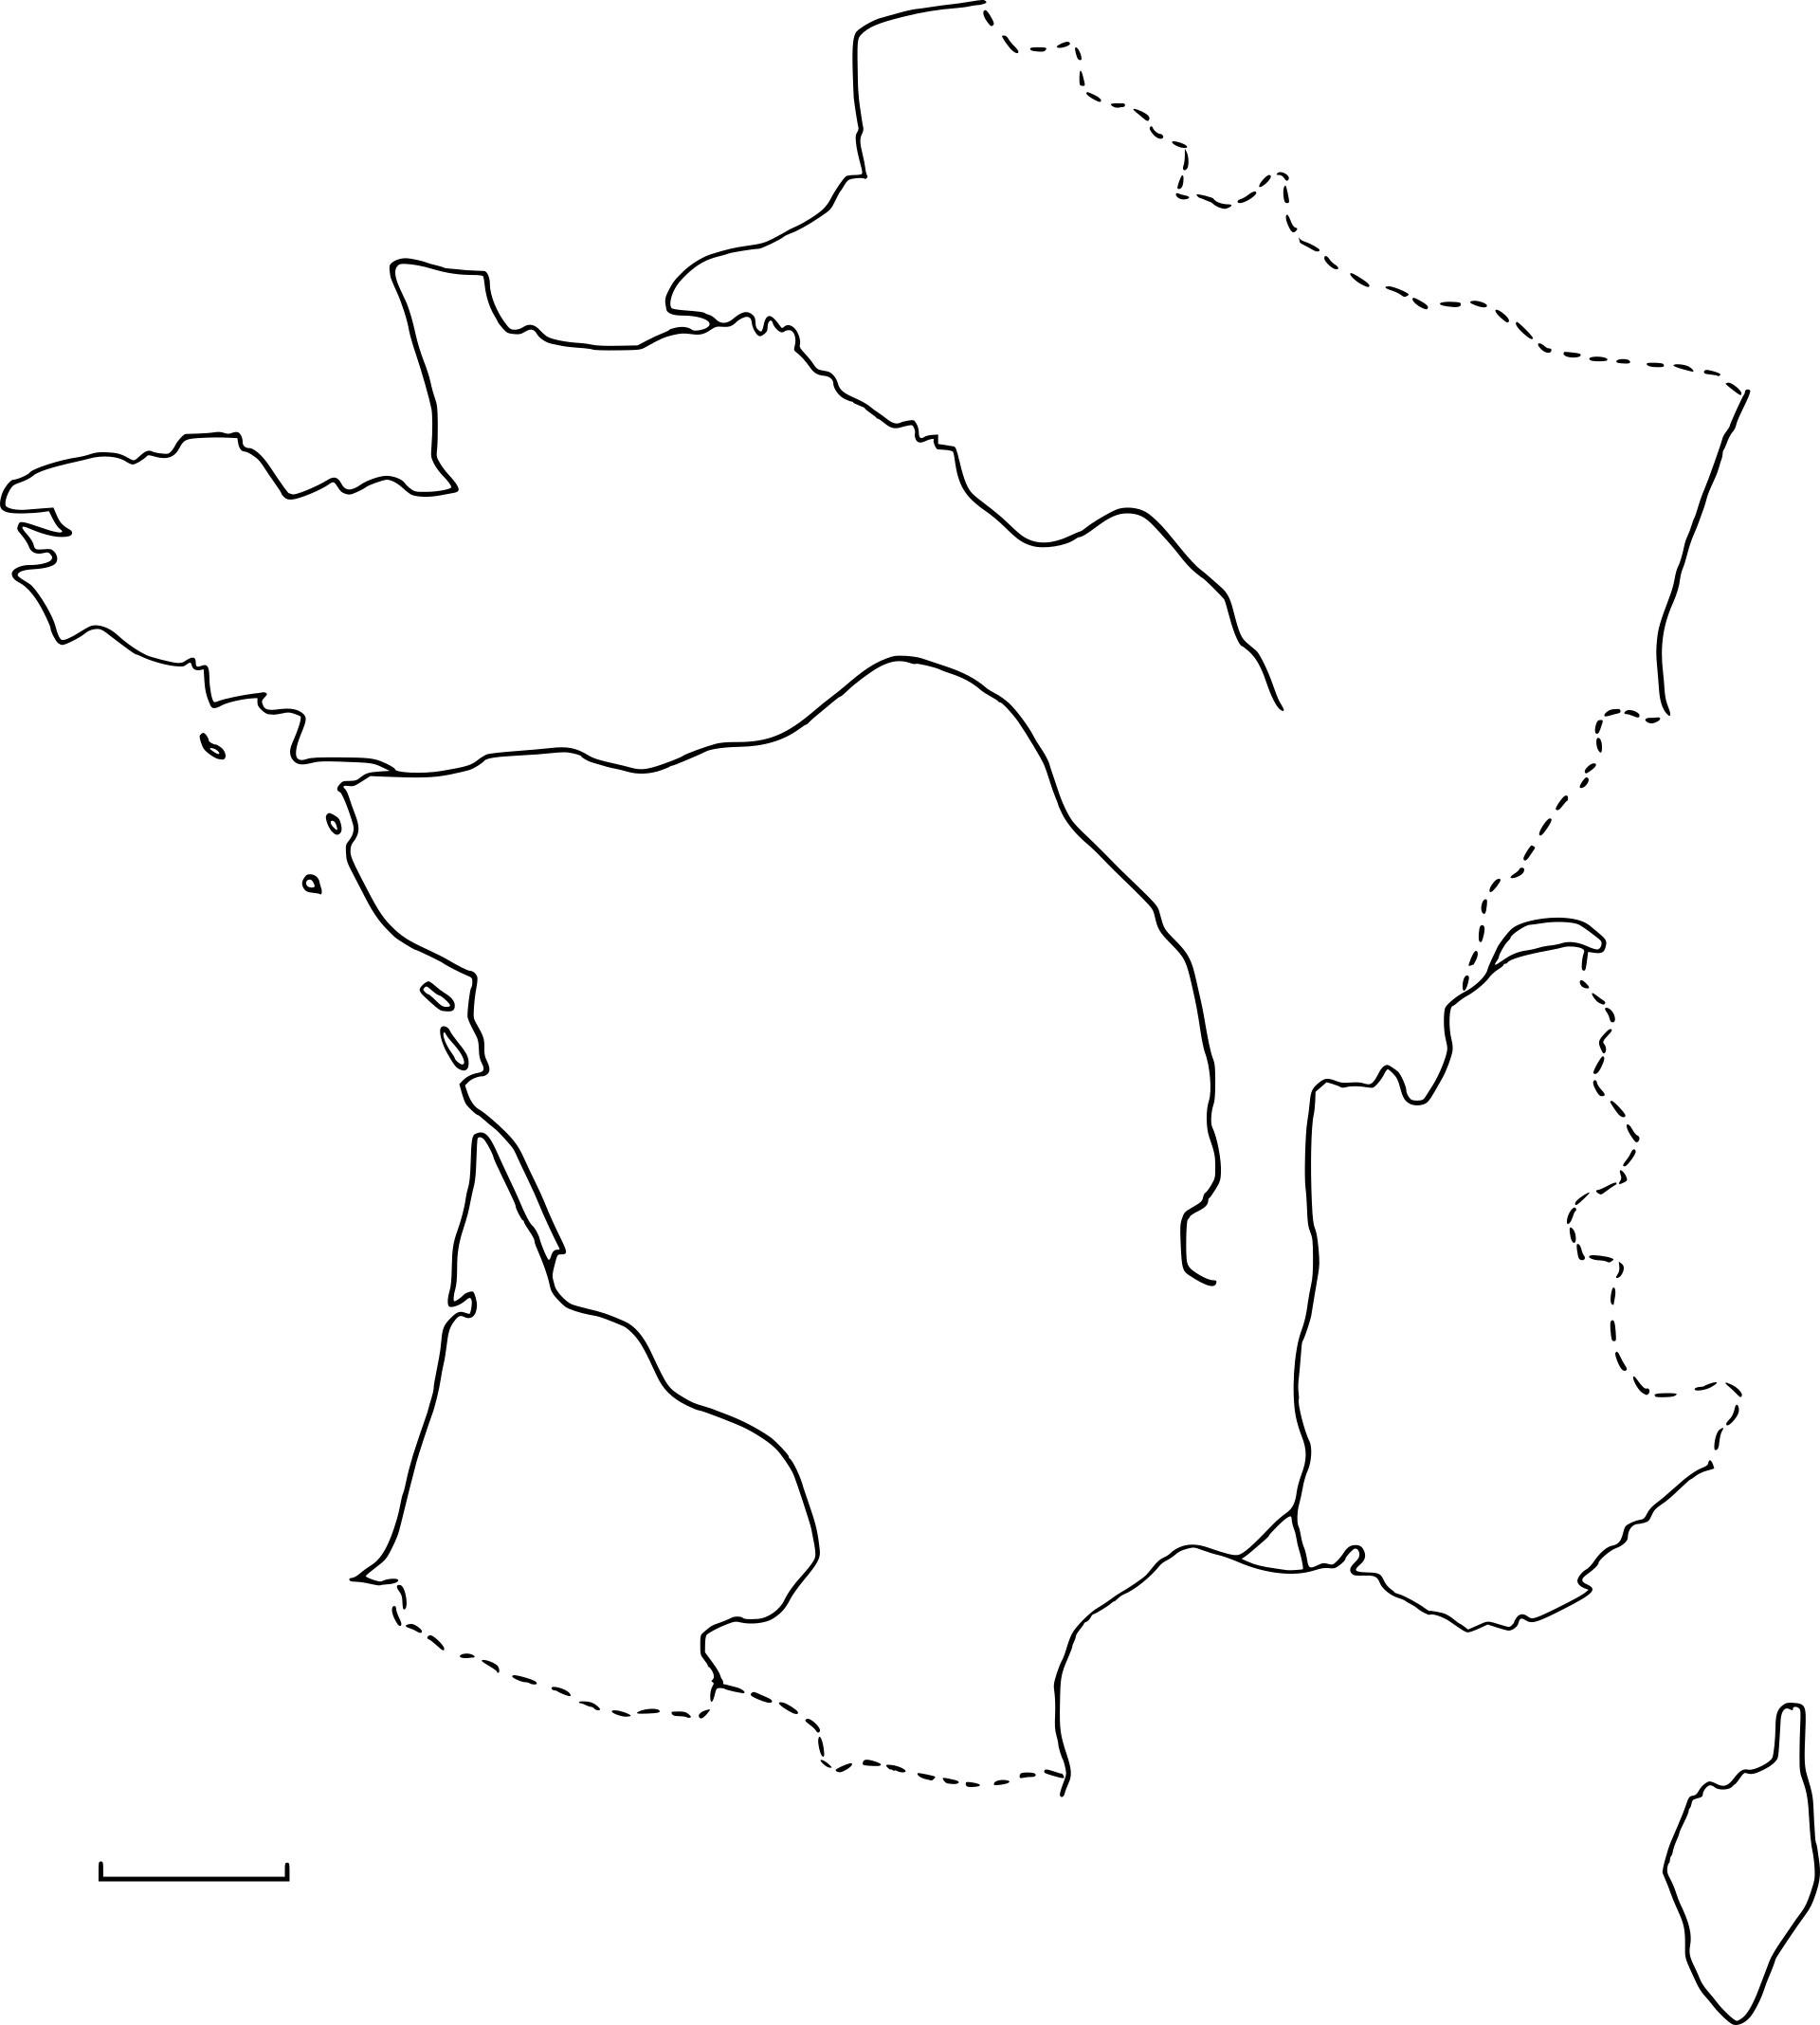 Carte De France A Imprimer Vierge | My Blog dedans Carte De France Avec Departement A Imprimer